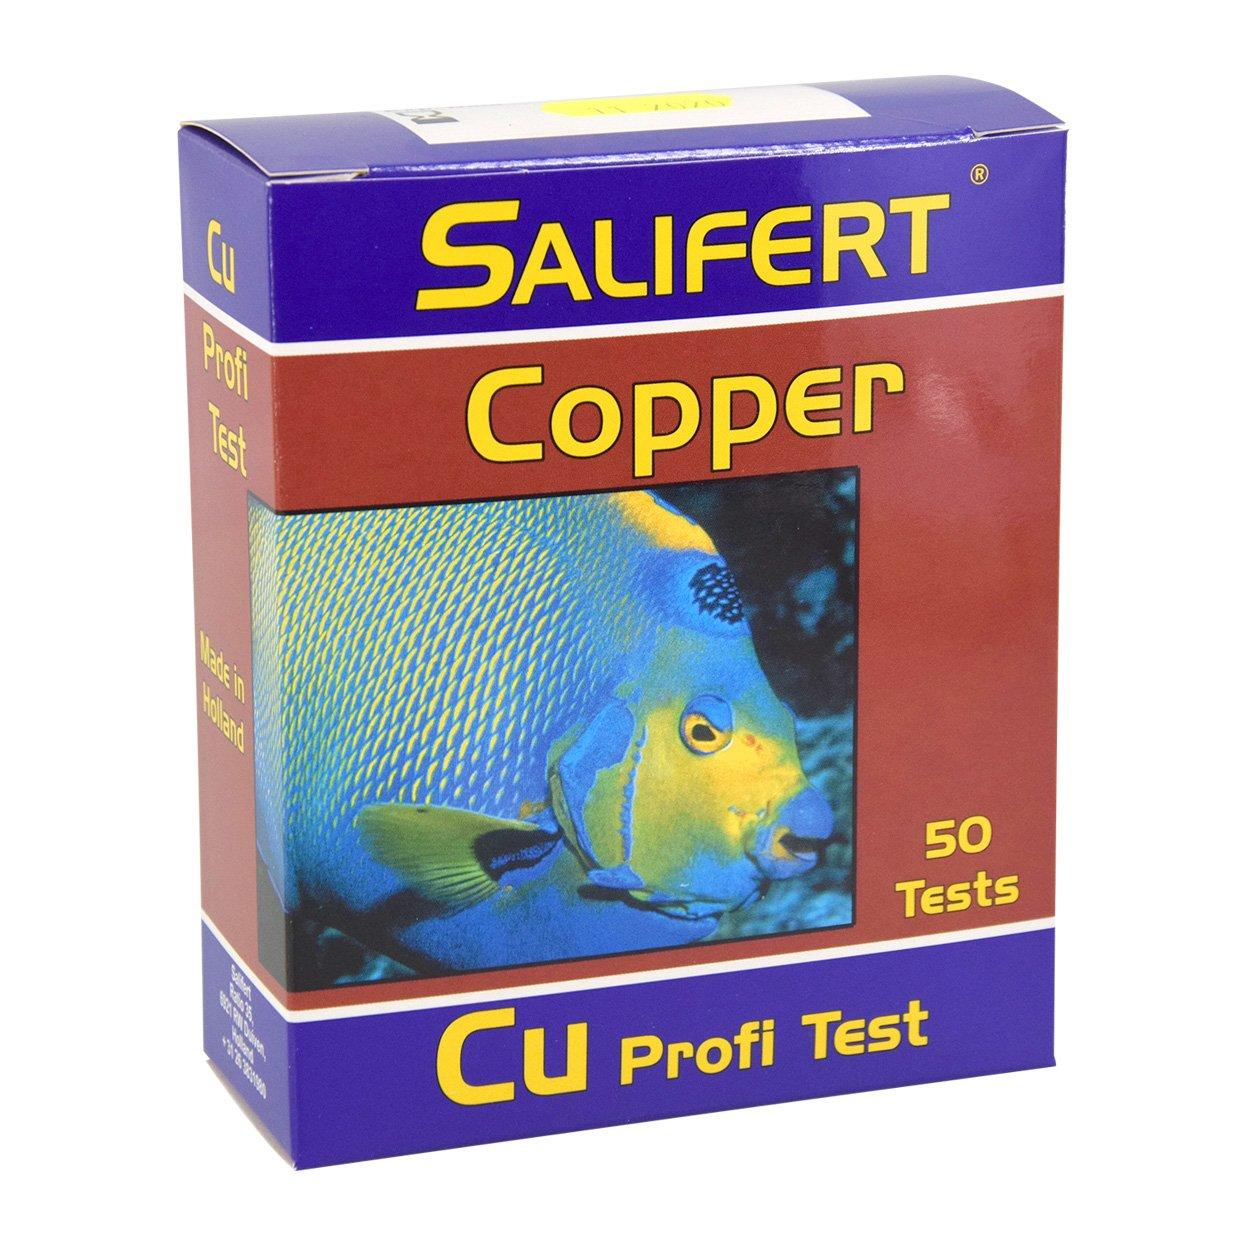 Salifert COPT Copper Test Kit